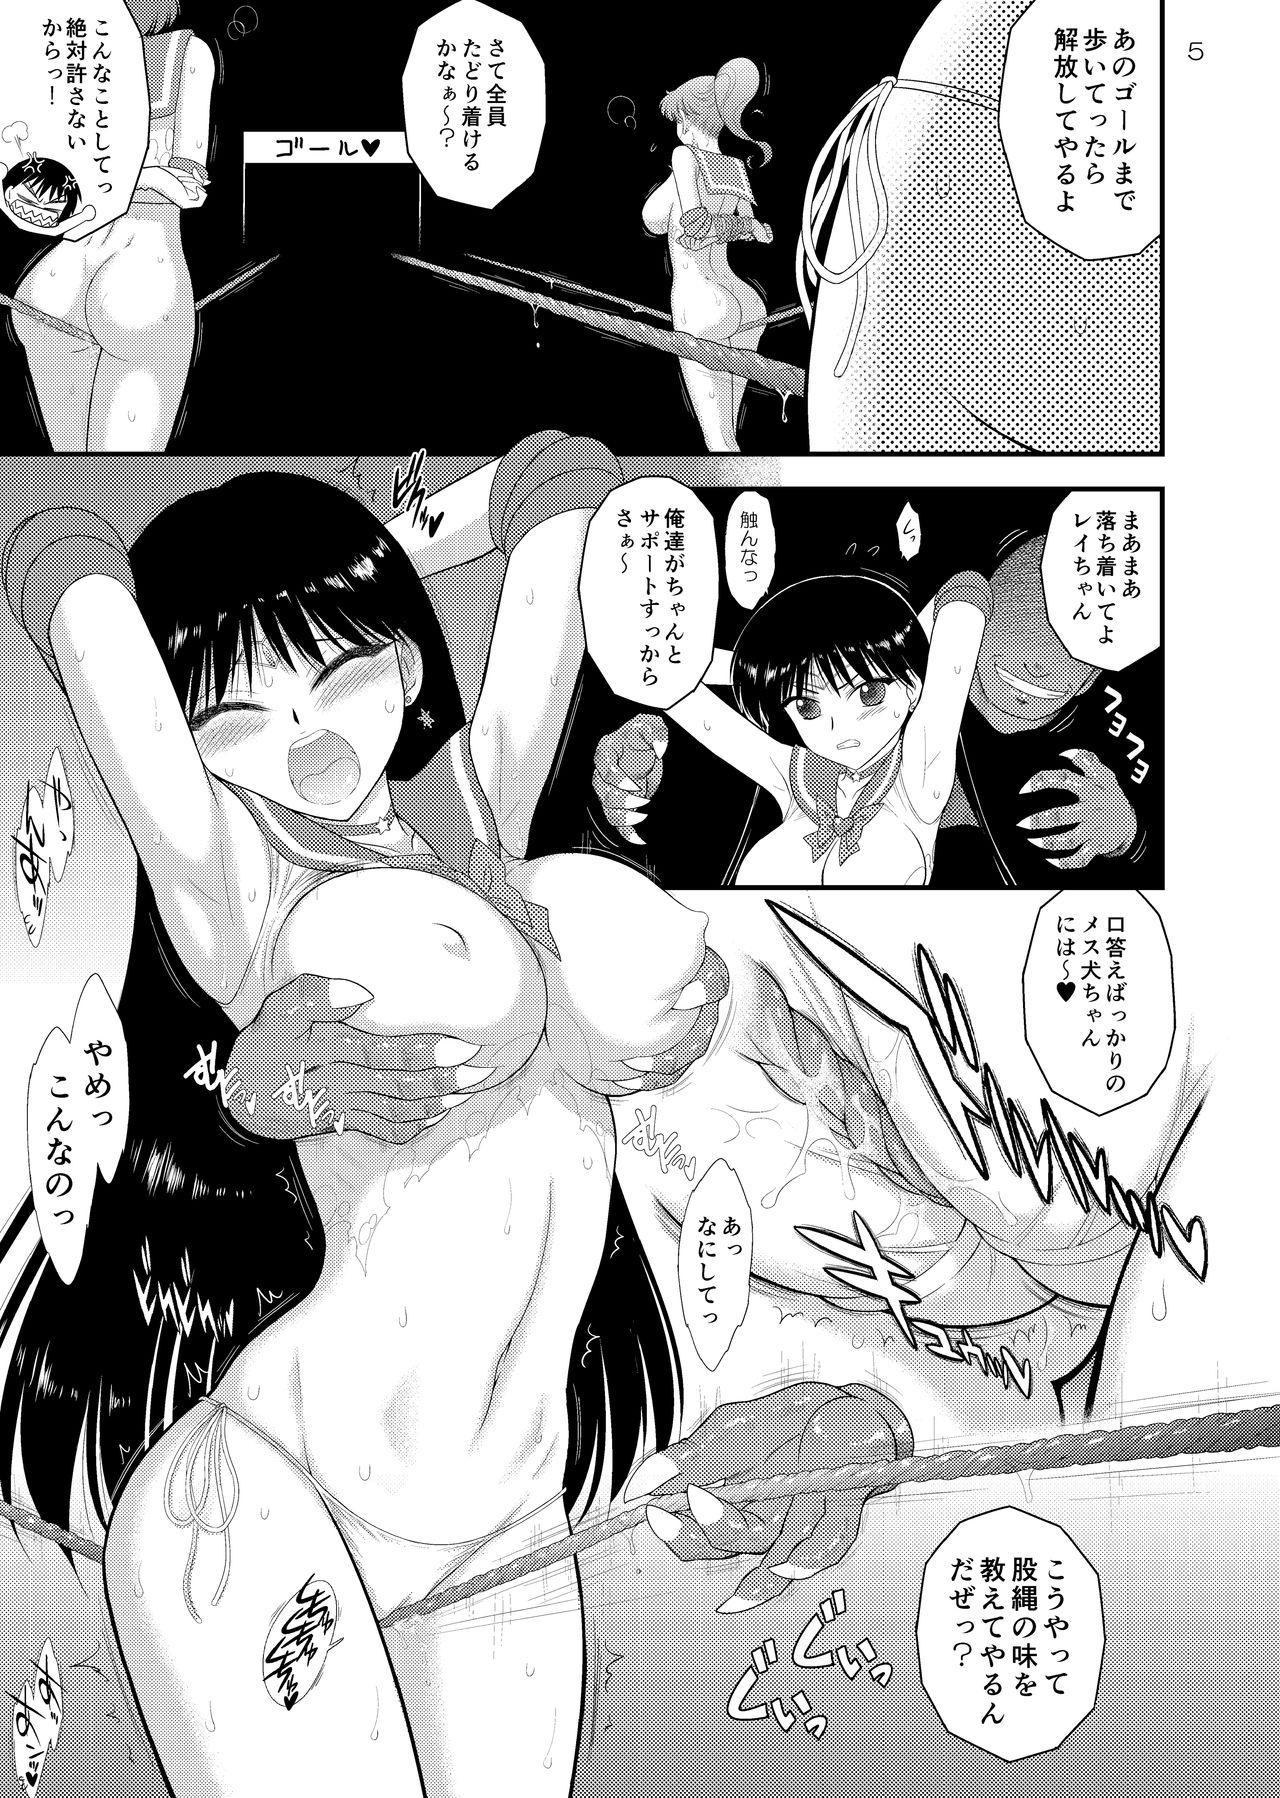 The Fertilization of Rei Hino 38